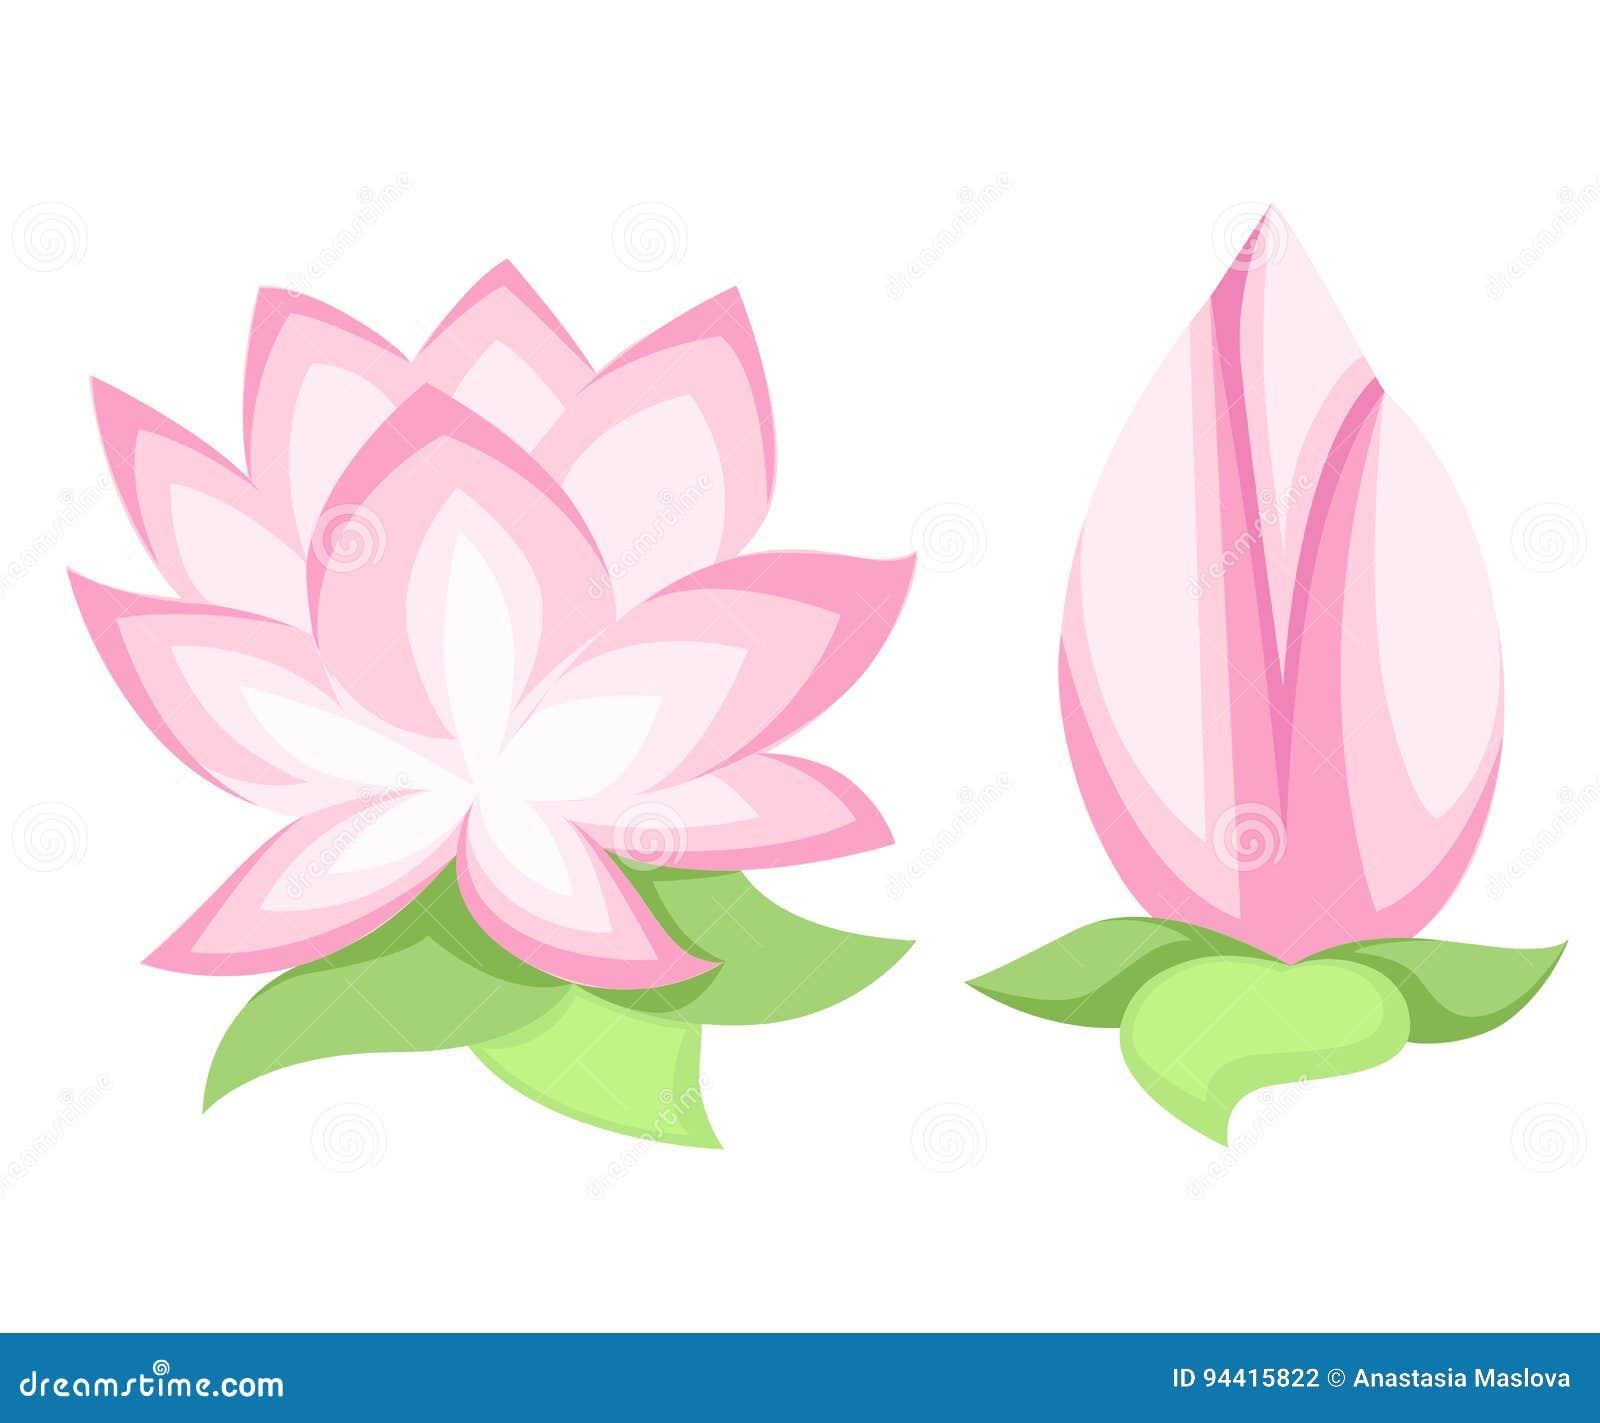 Vector illustration beautiful pink lotus flower isolated on white vector illustration beautiful pink lotus flower isolated on white background stylish floral spring wallpaper greeting or invitation card izmirmasajfo